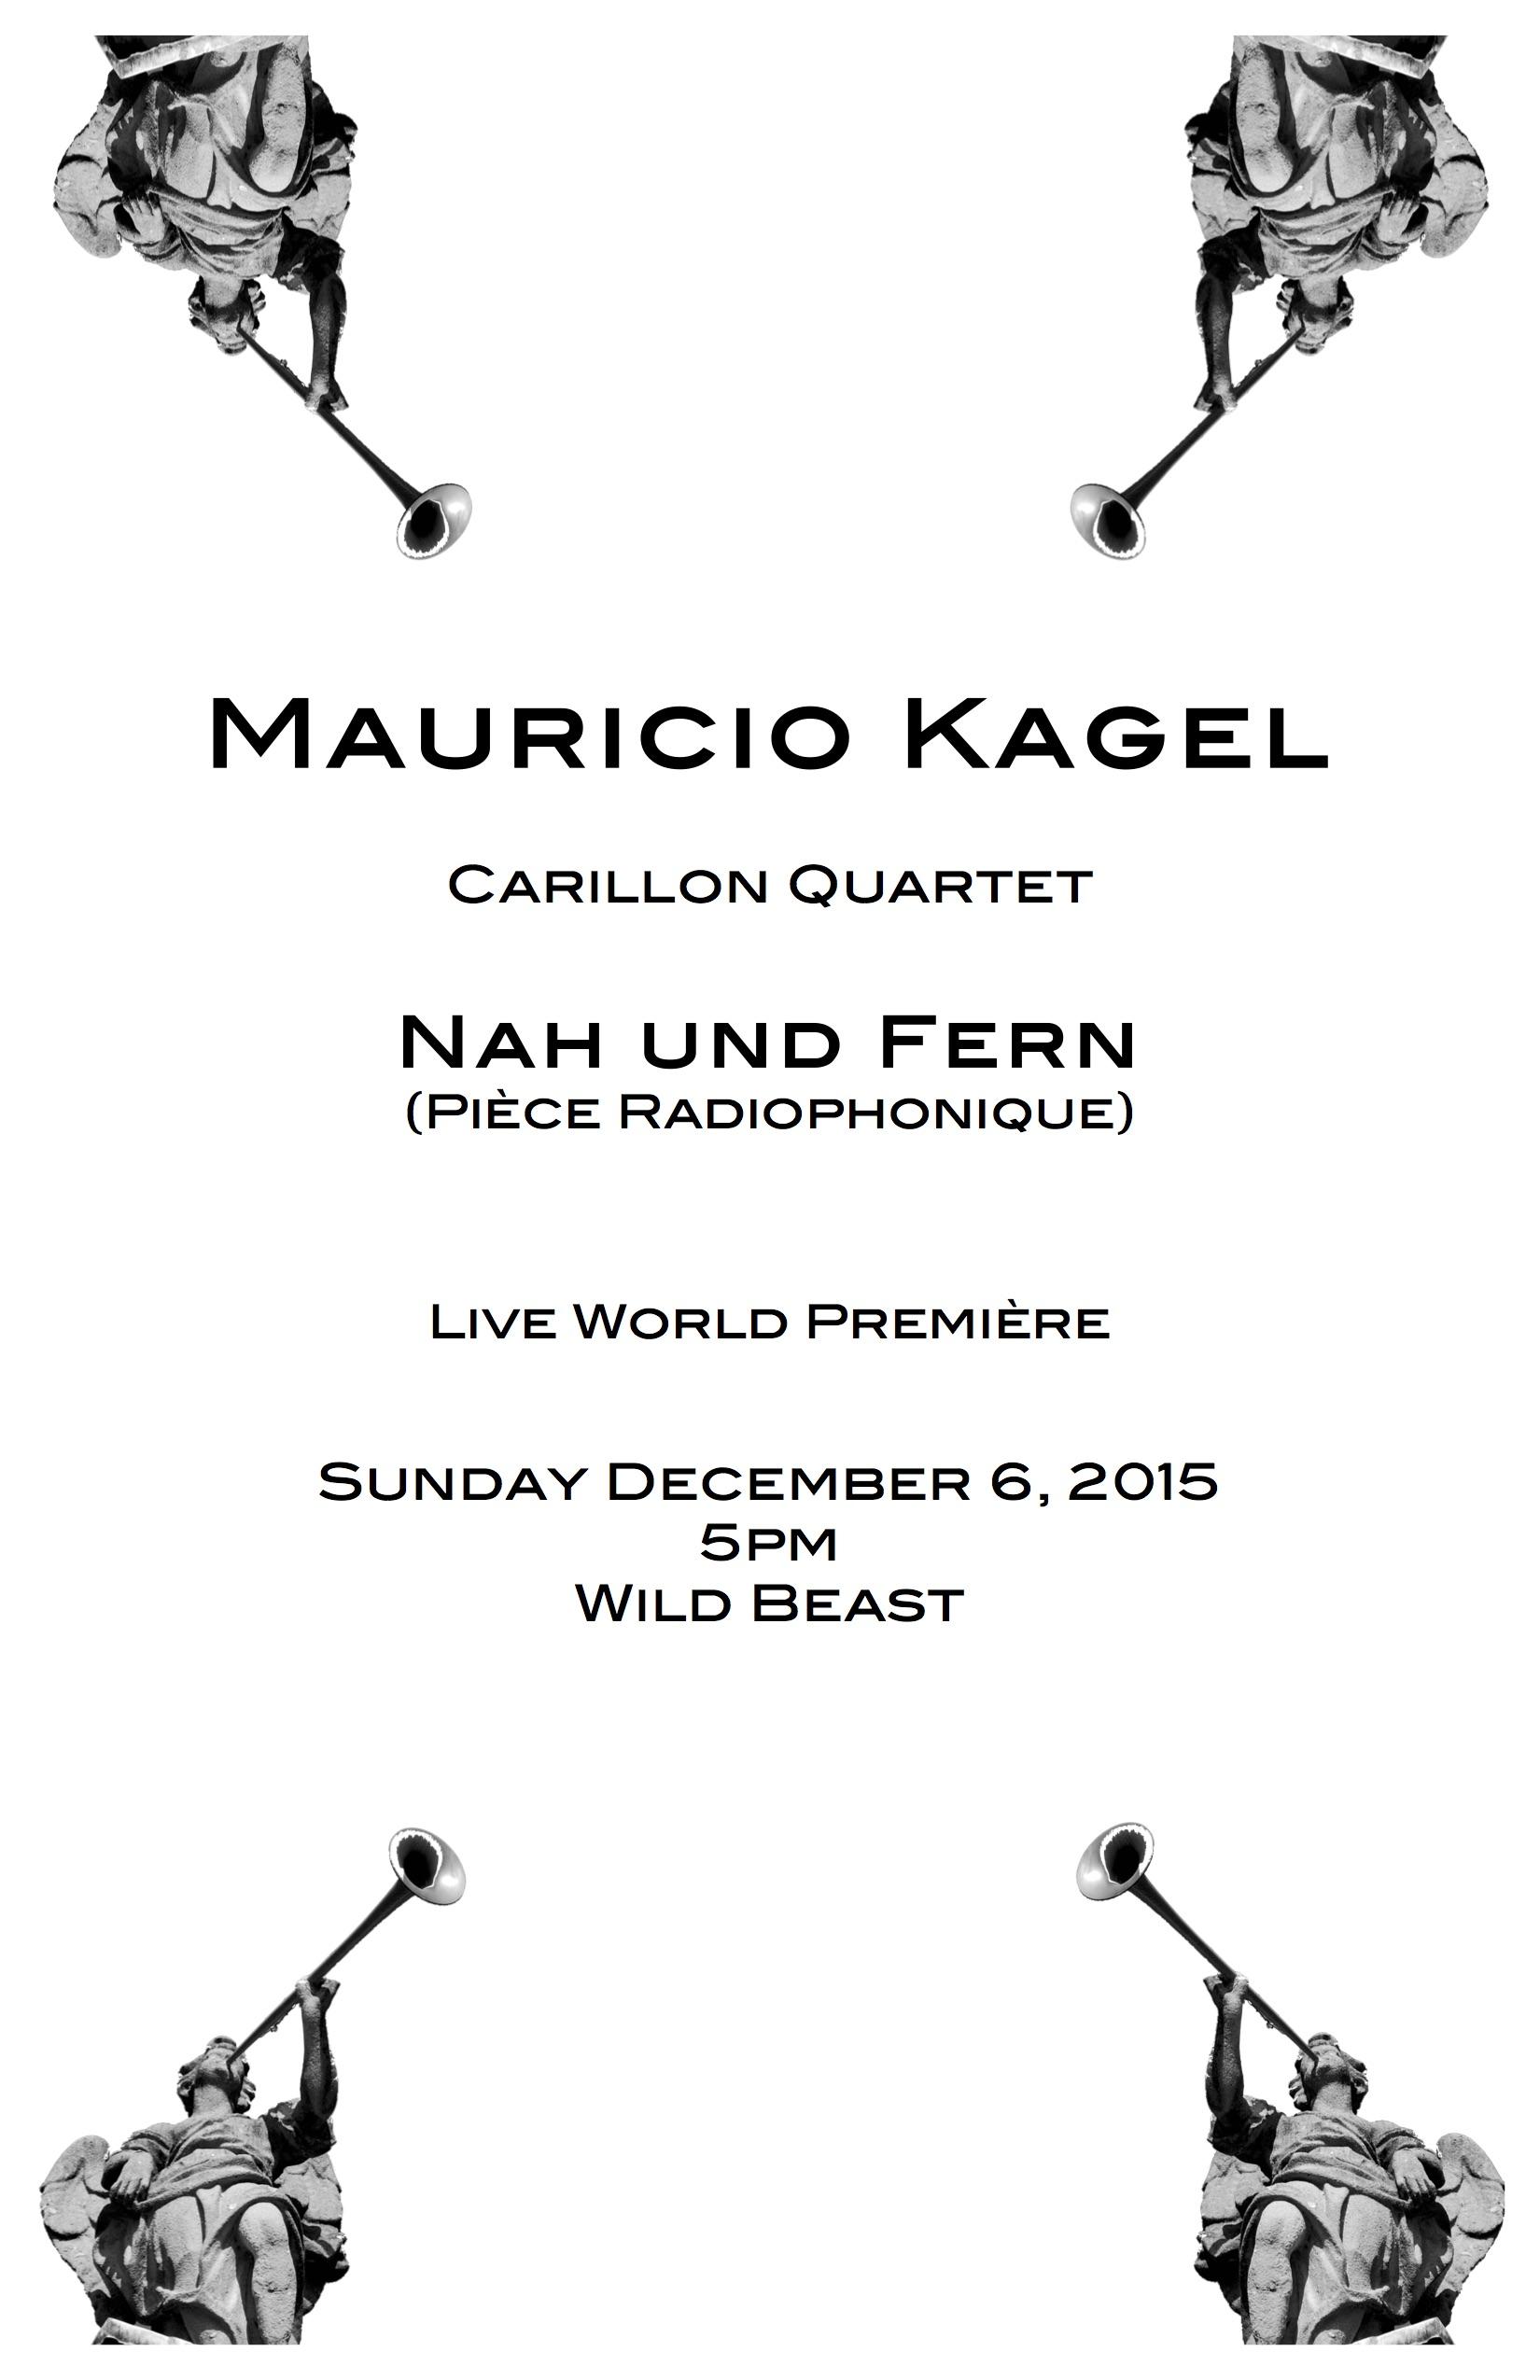 Nah und Fern, World Première - Poster by: Nicolás Bejarano